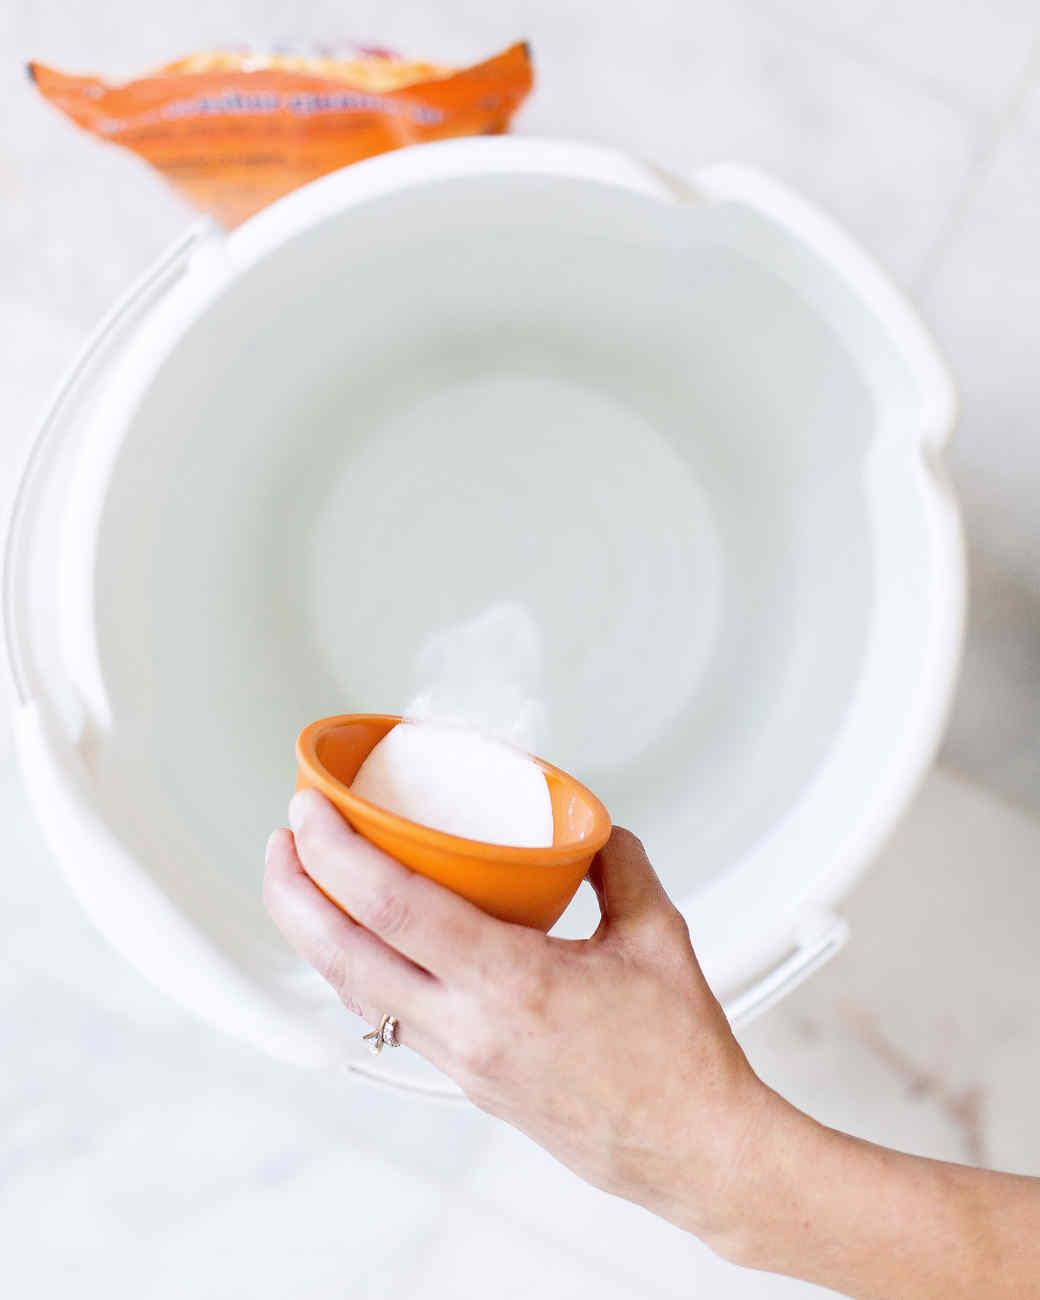 how-to-clean-bathroom-surfaces-tile-floors-0316.jpg